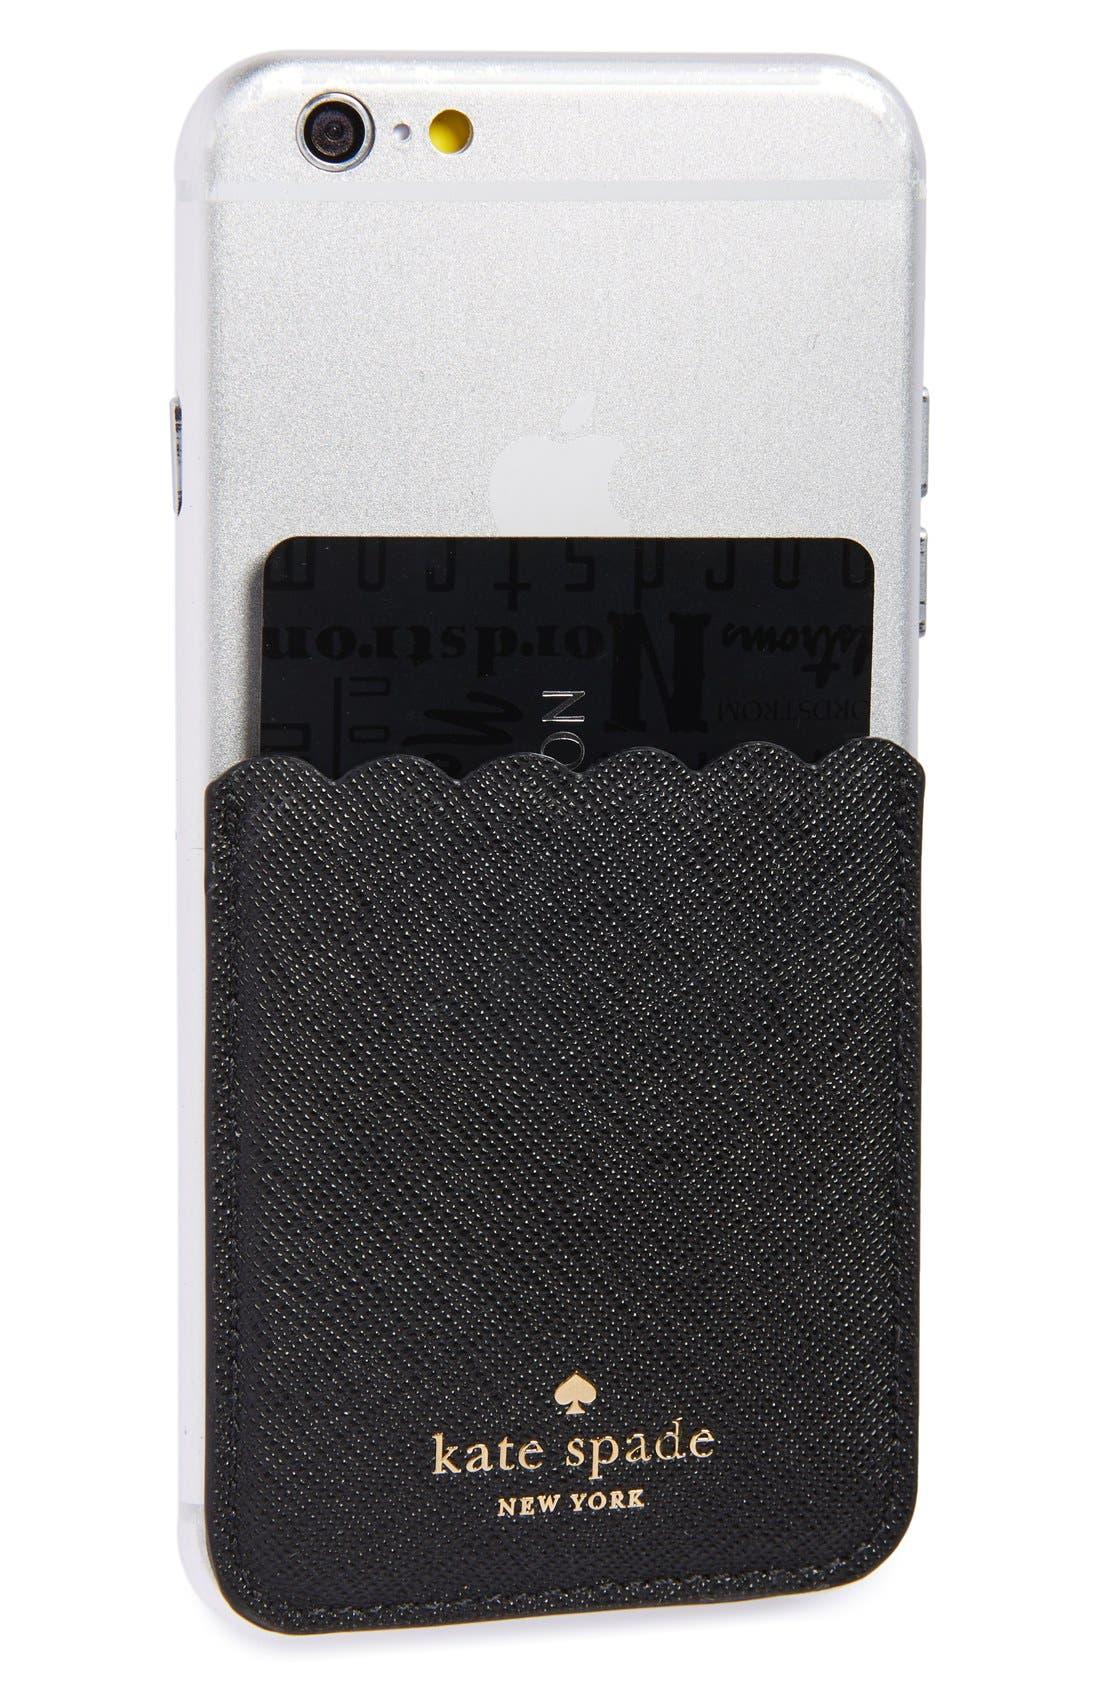 kate spade new york scallop leather stick-on smartphone case pocket